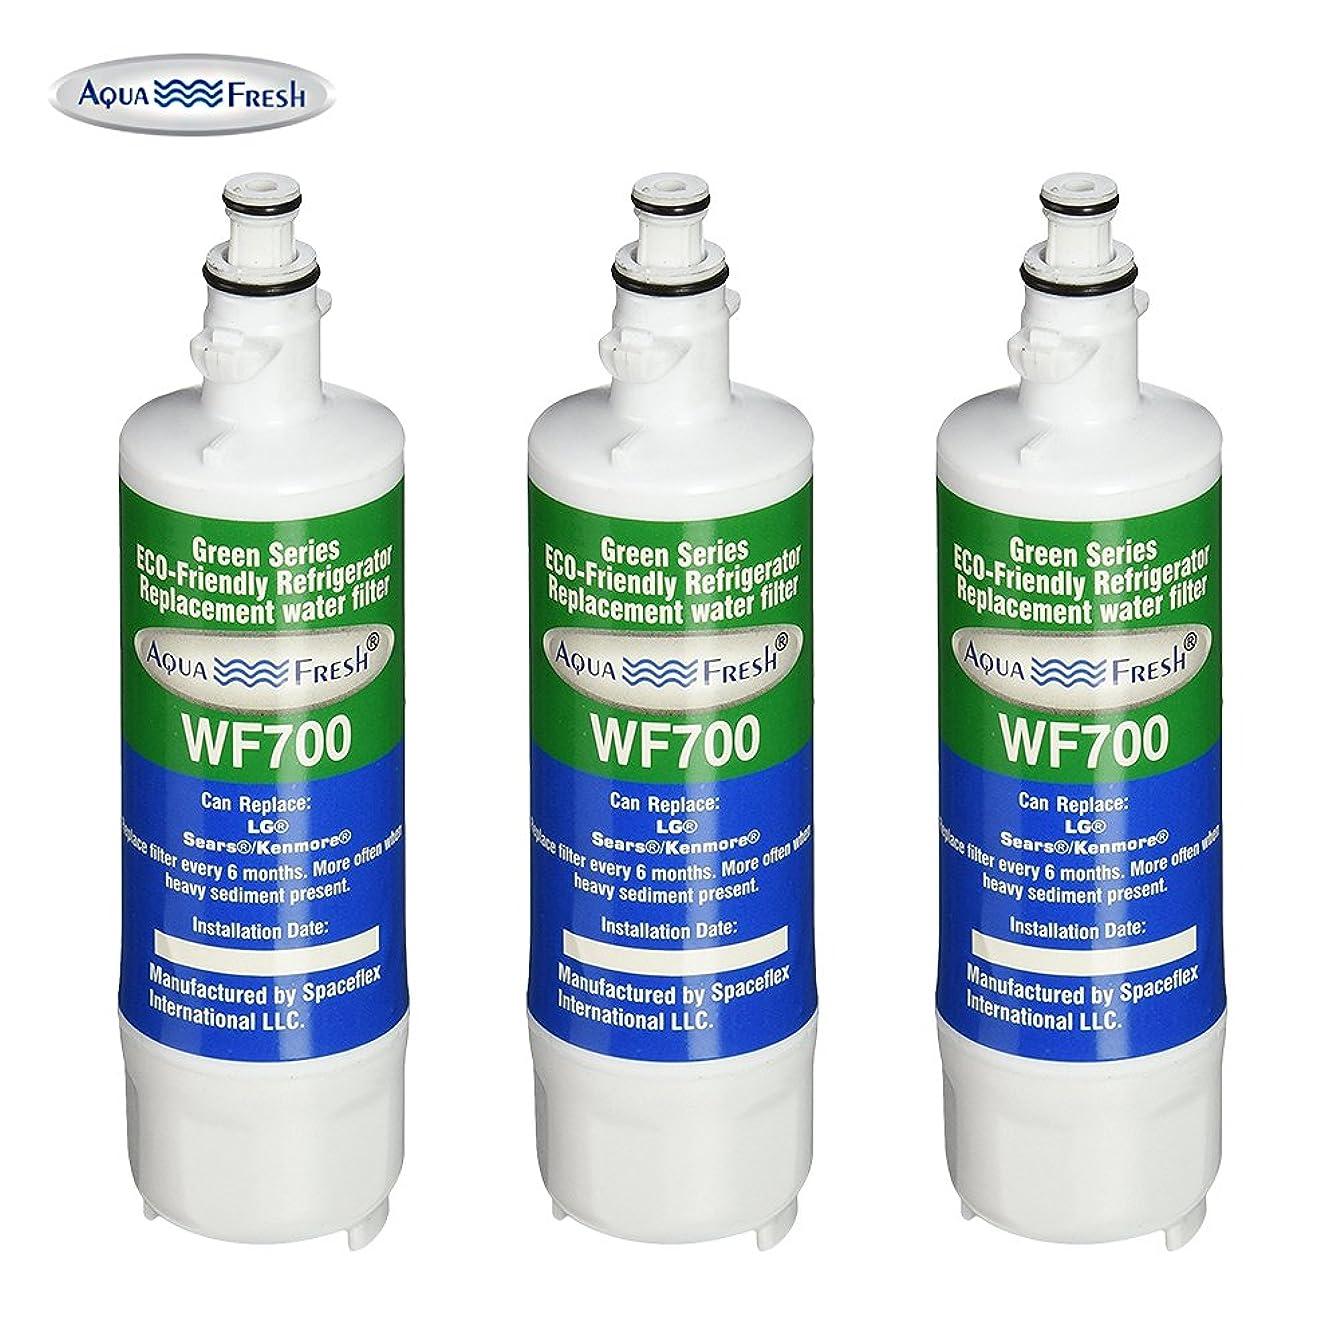 Replacement Water Filter for LG LFXS30726S / LFXS30766S / LFXS32726S / LFXS32766S Refrigerators (3 Pack)